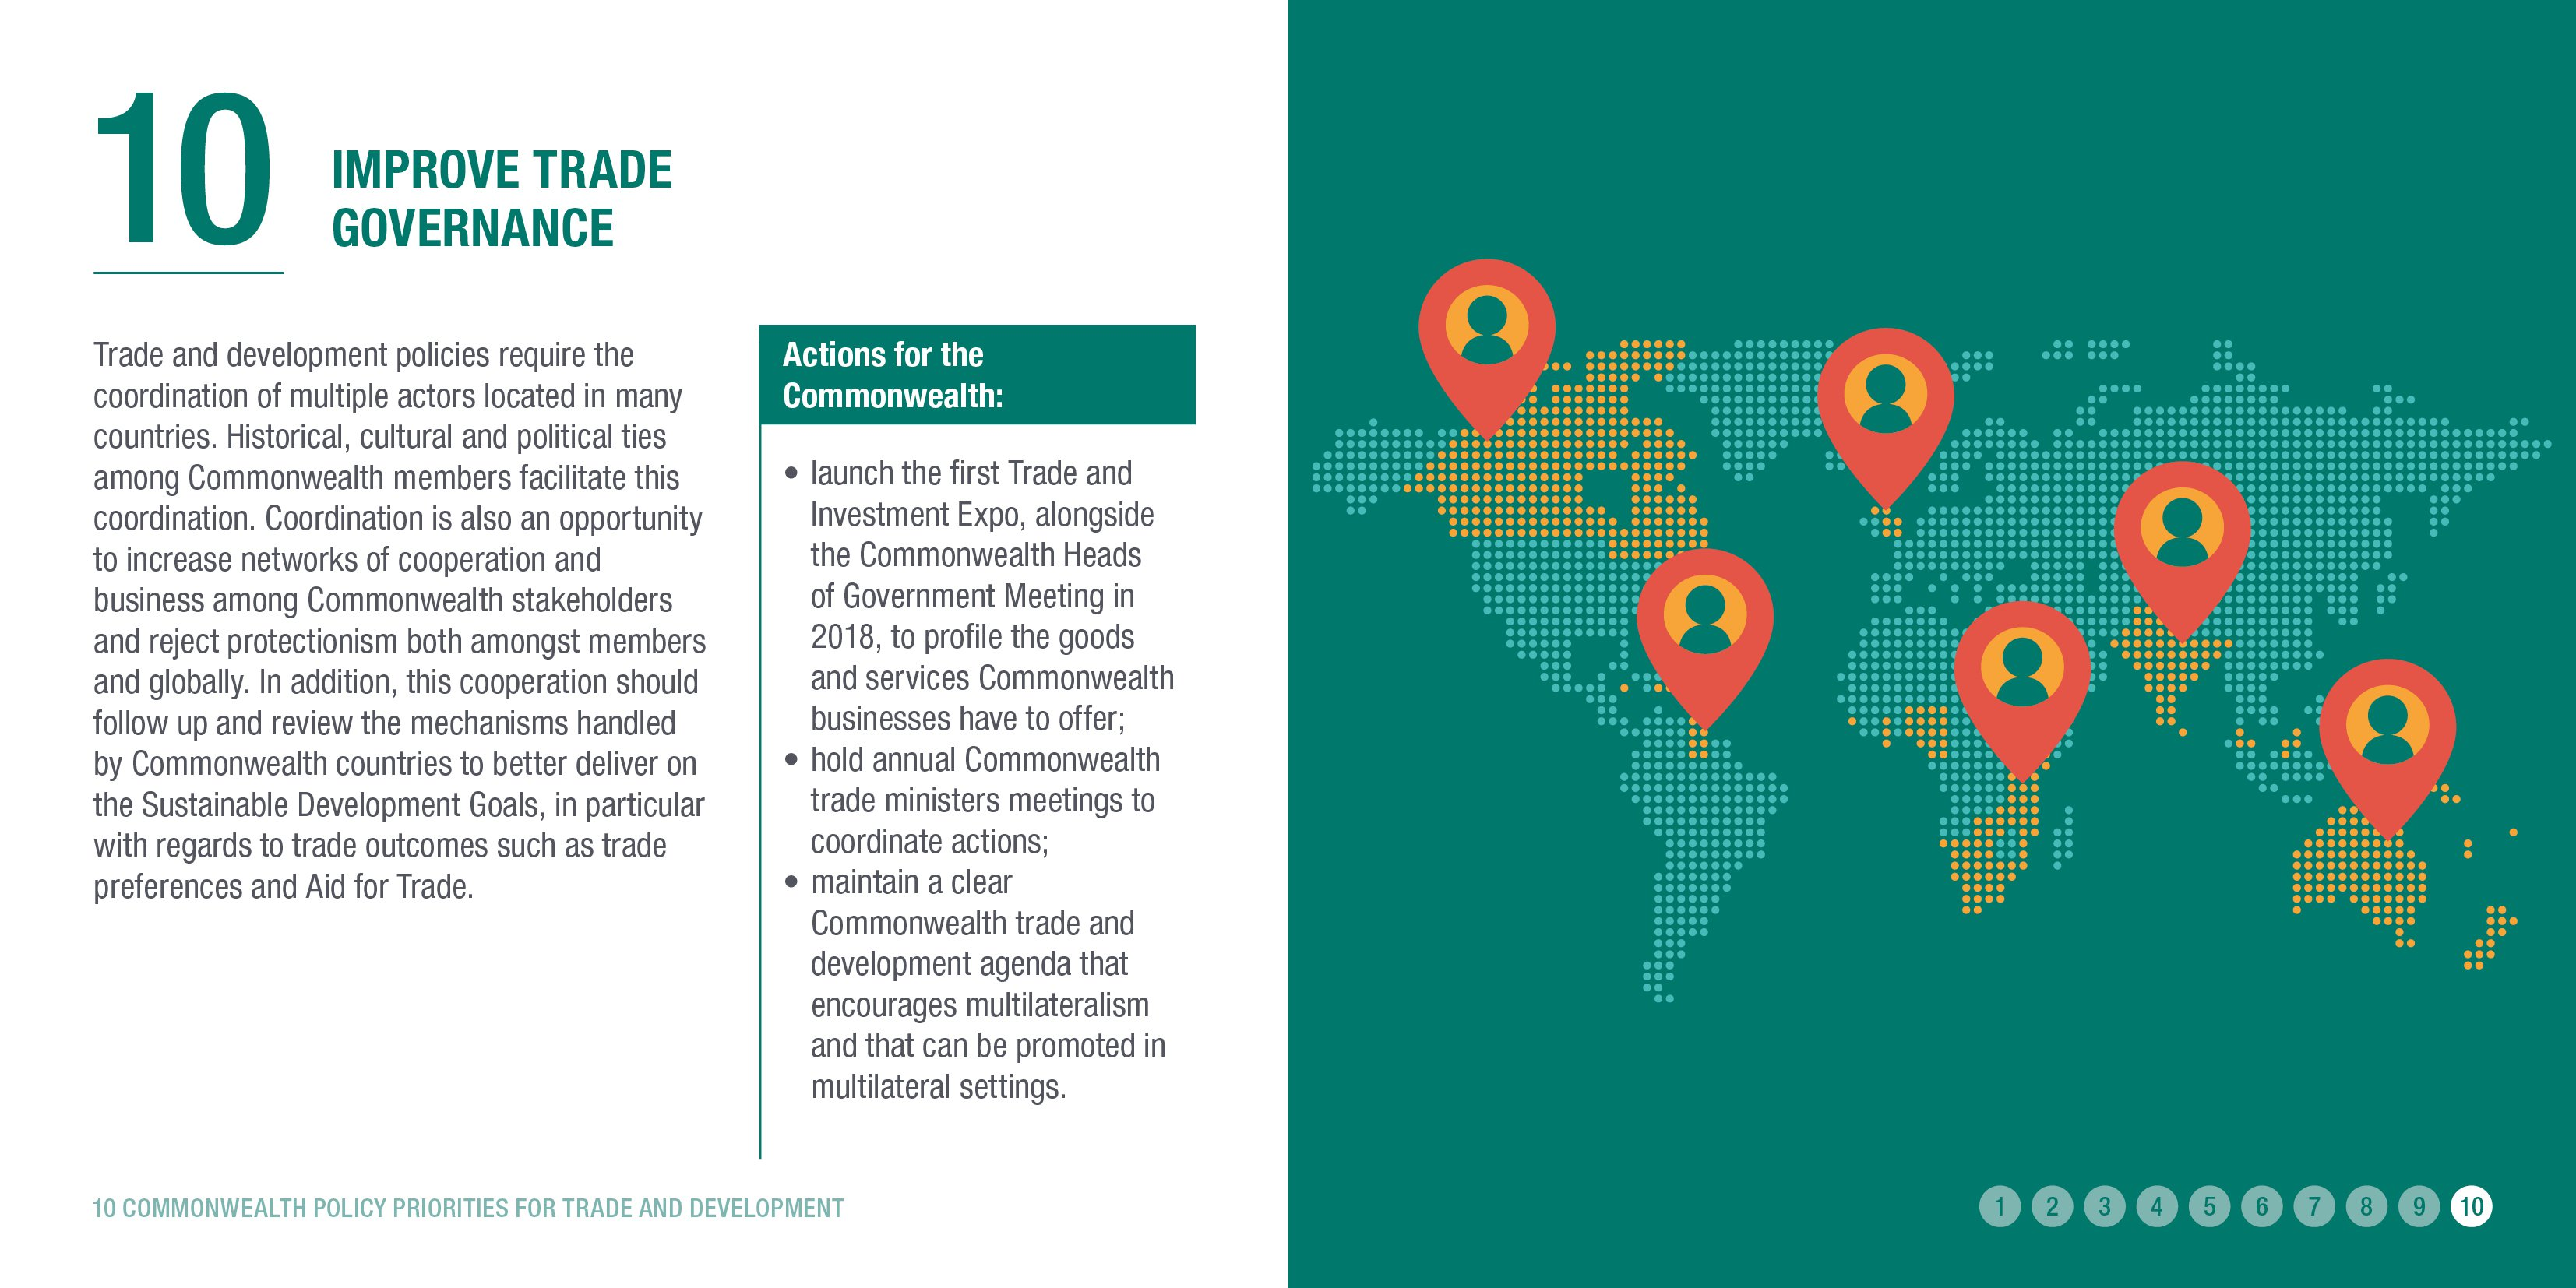 Improve trade governance